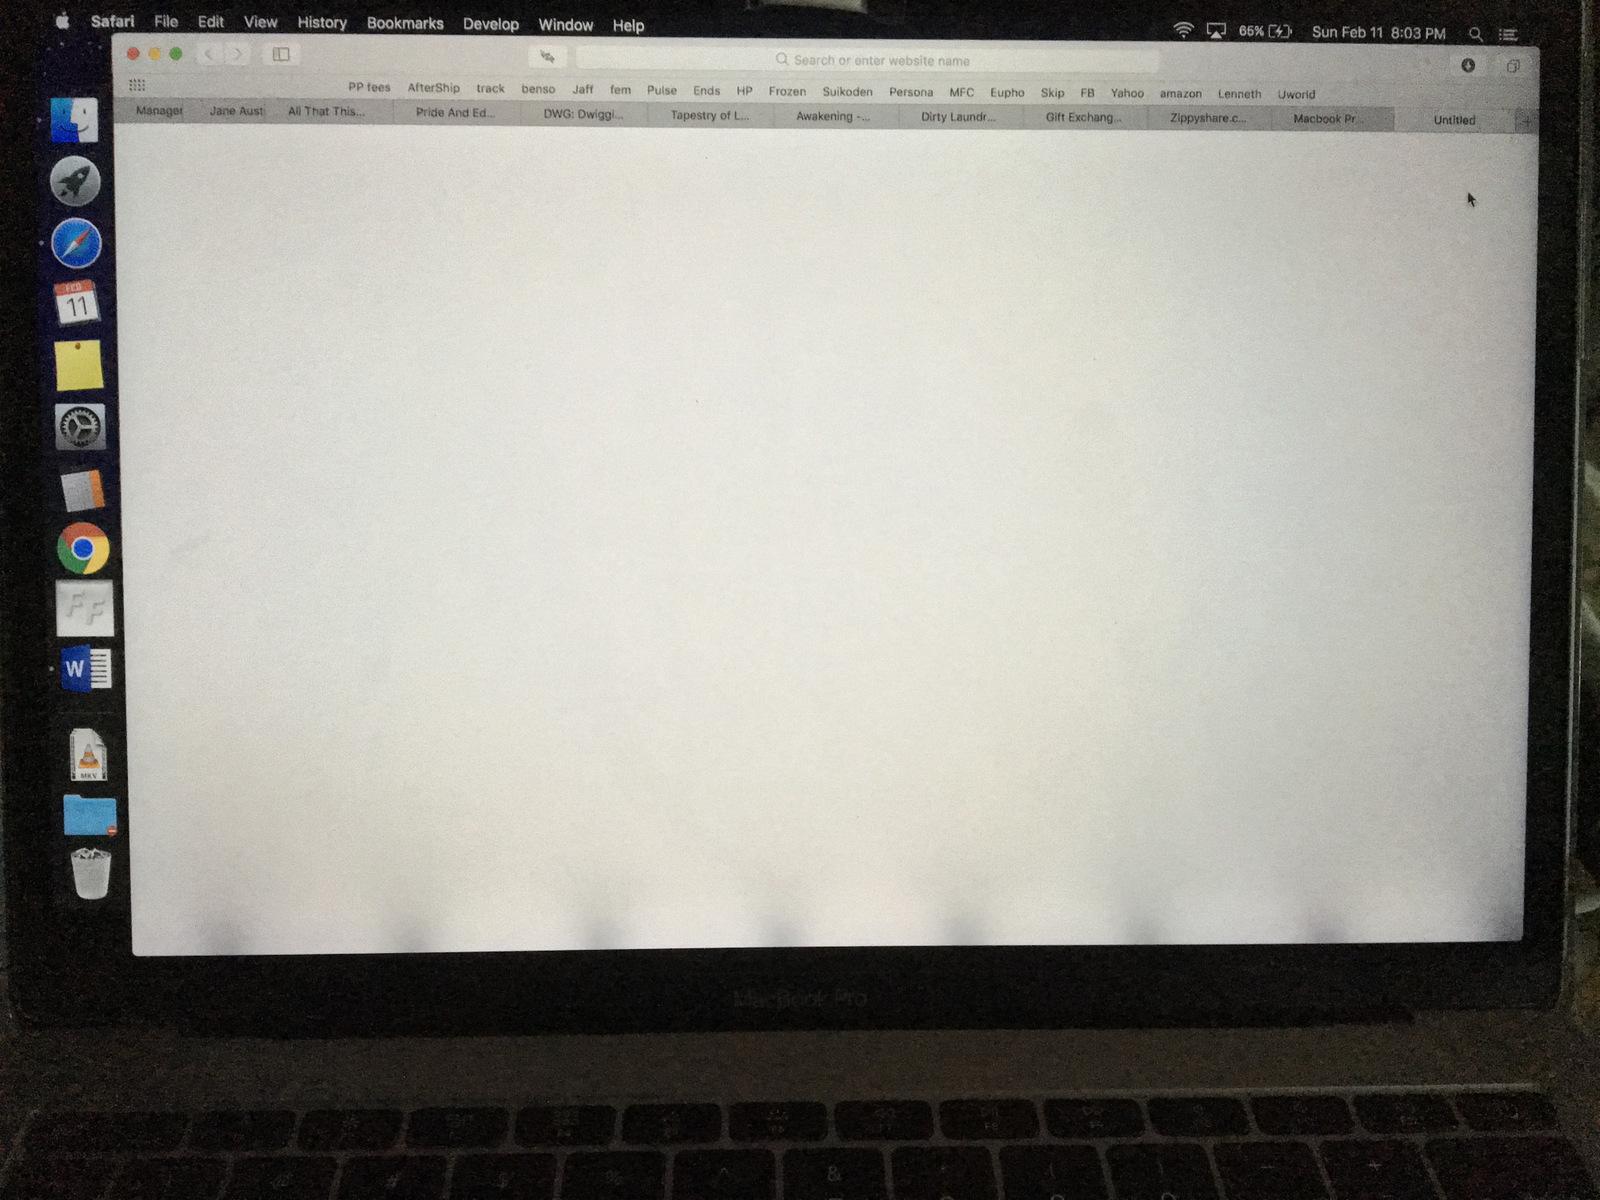 Ещё одна проблема с дисплеями MacBook Pro